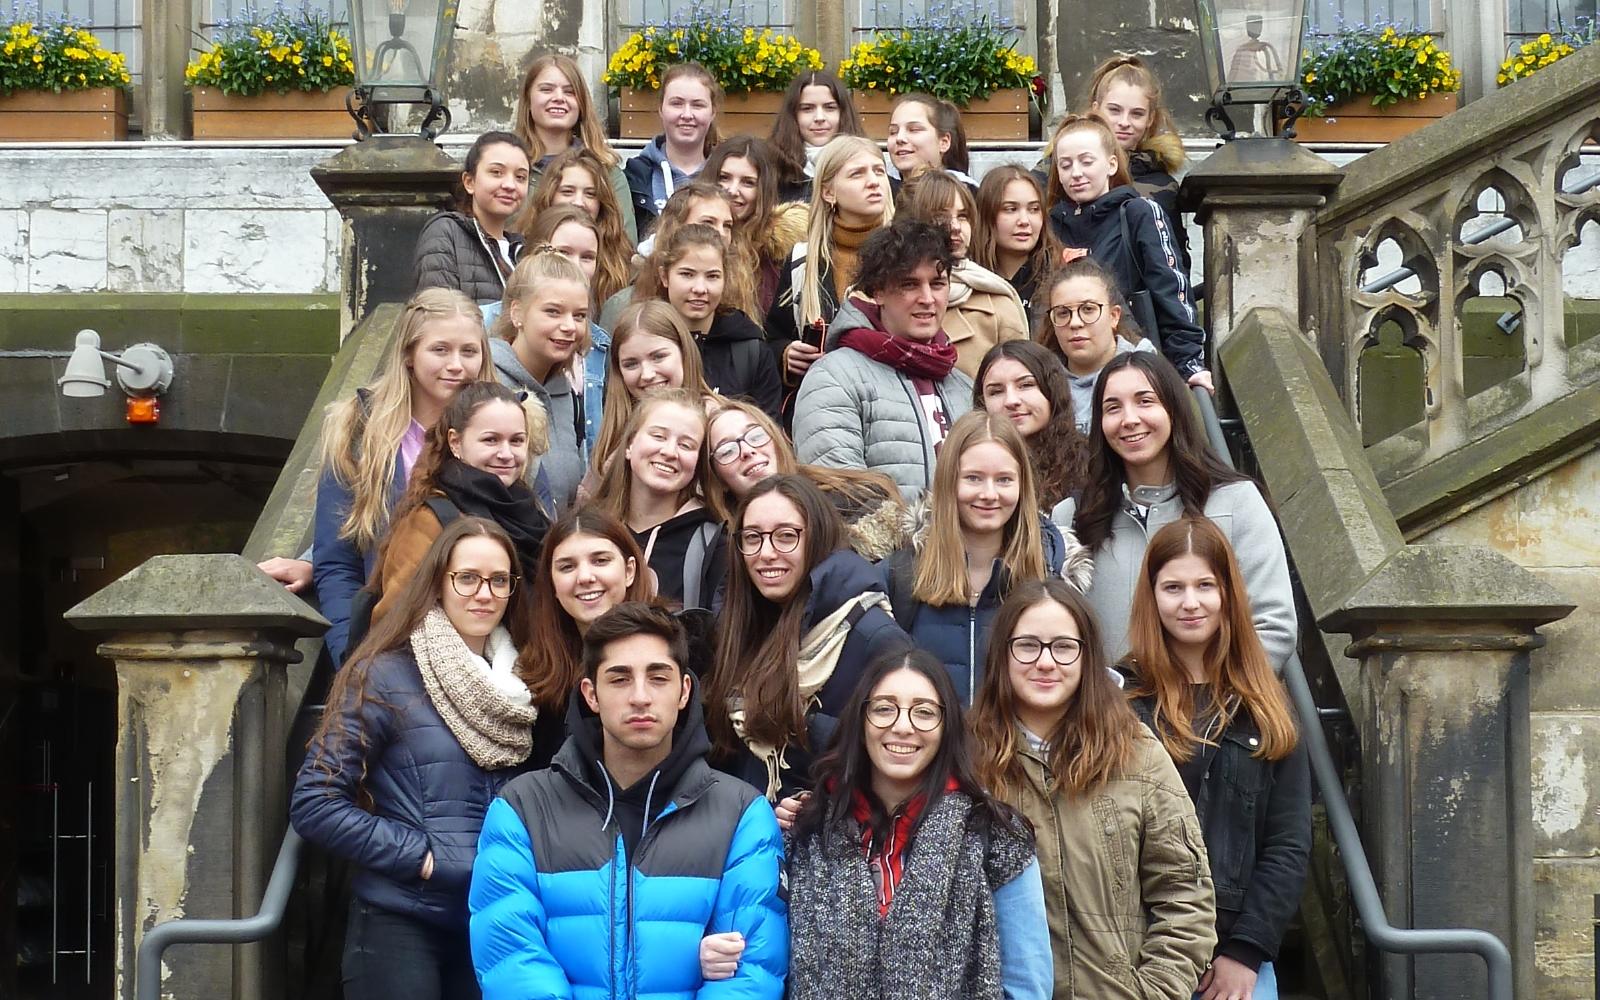 Italienische Schülergruppe am GAM